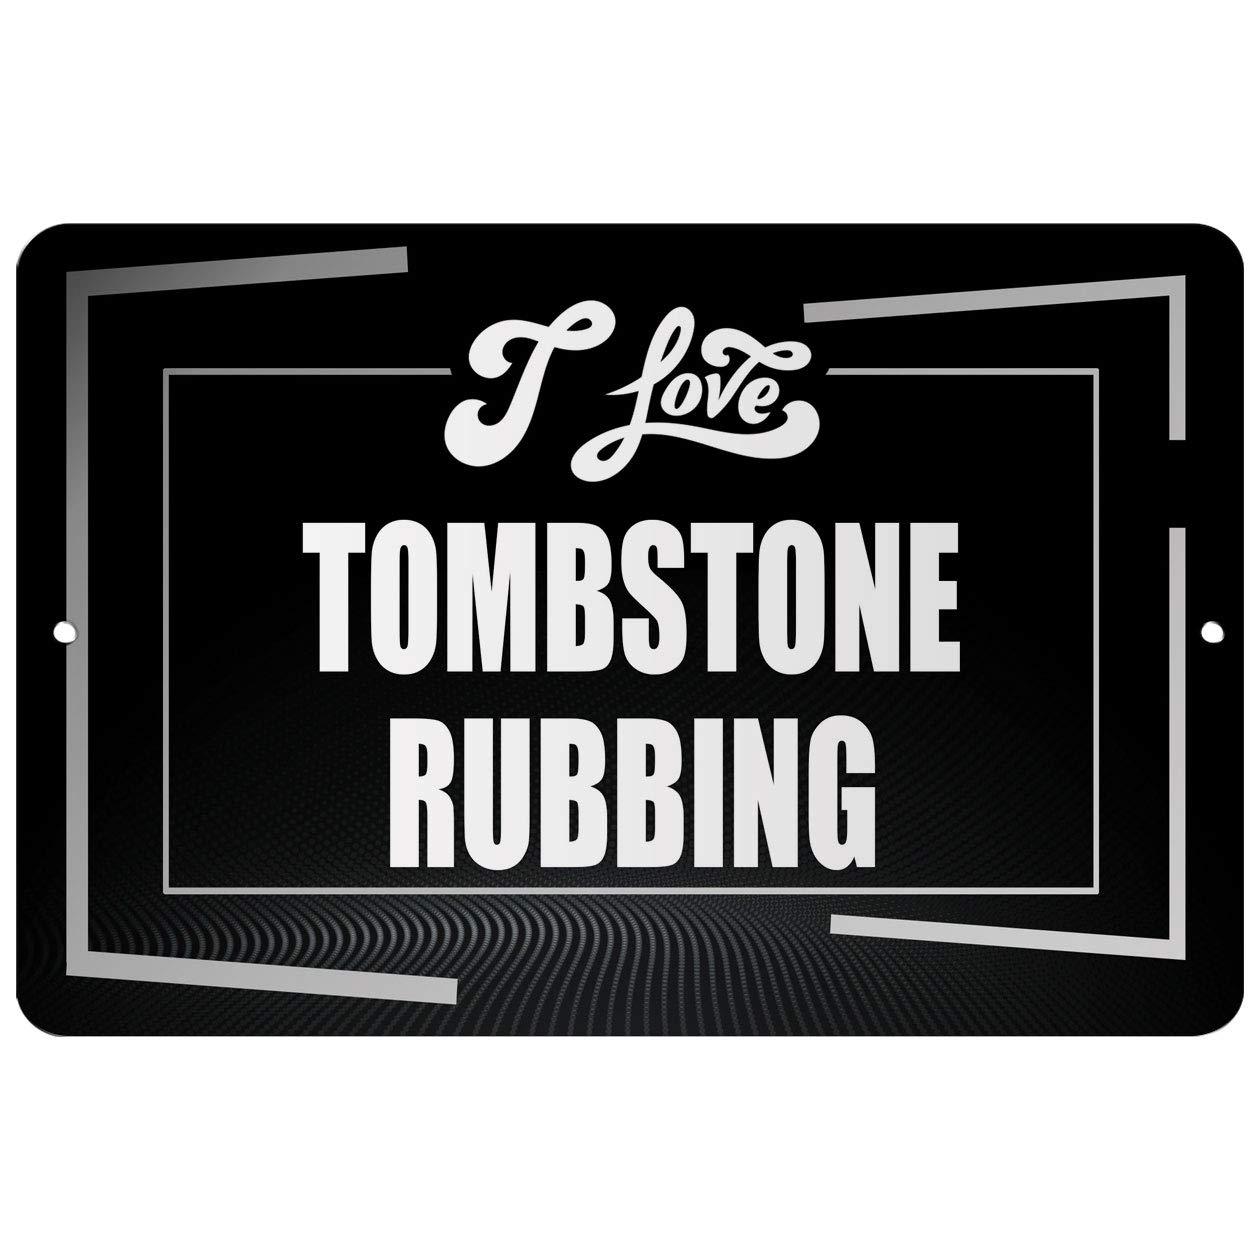 Makoroni - I Love Tombstone RUBBING Hobby - Street Sign 12''x18'' Aluminum by Makoroni